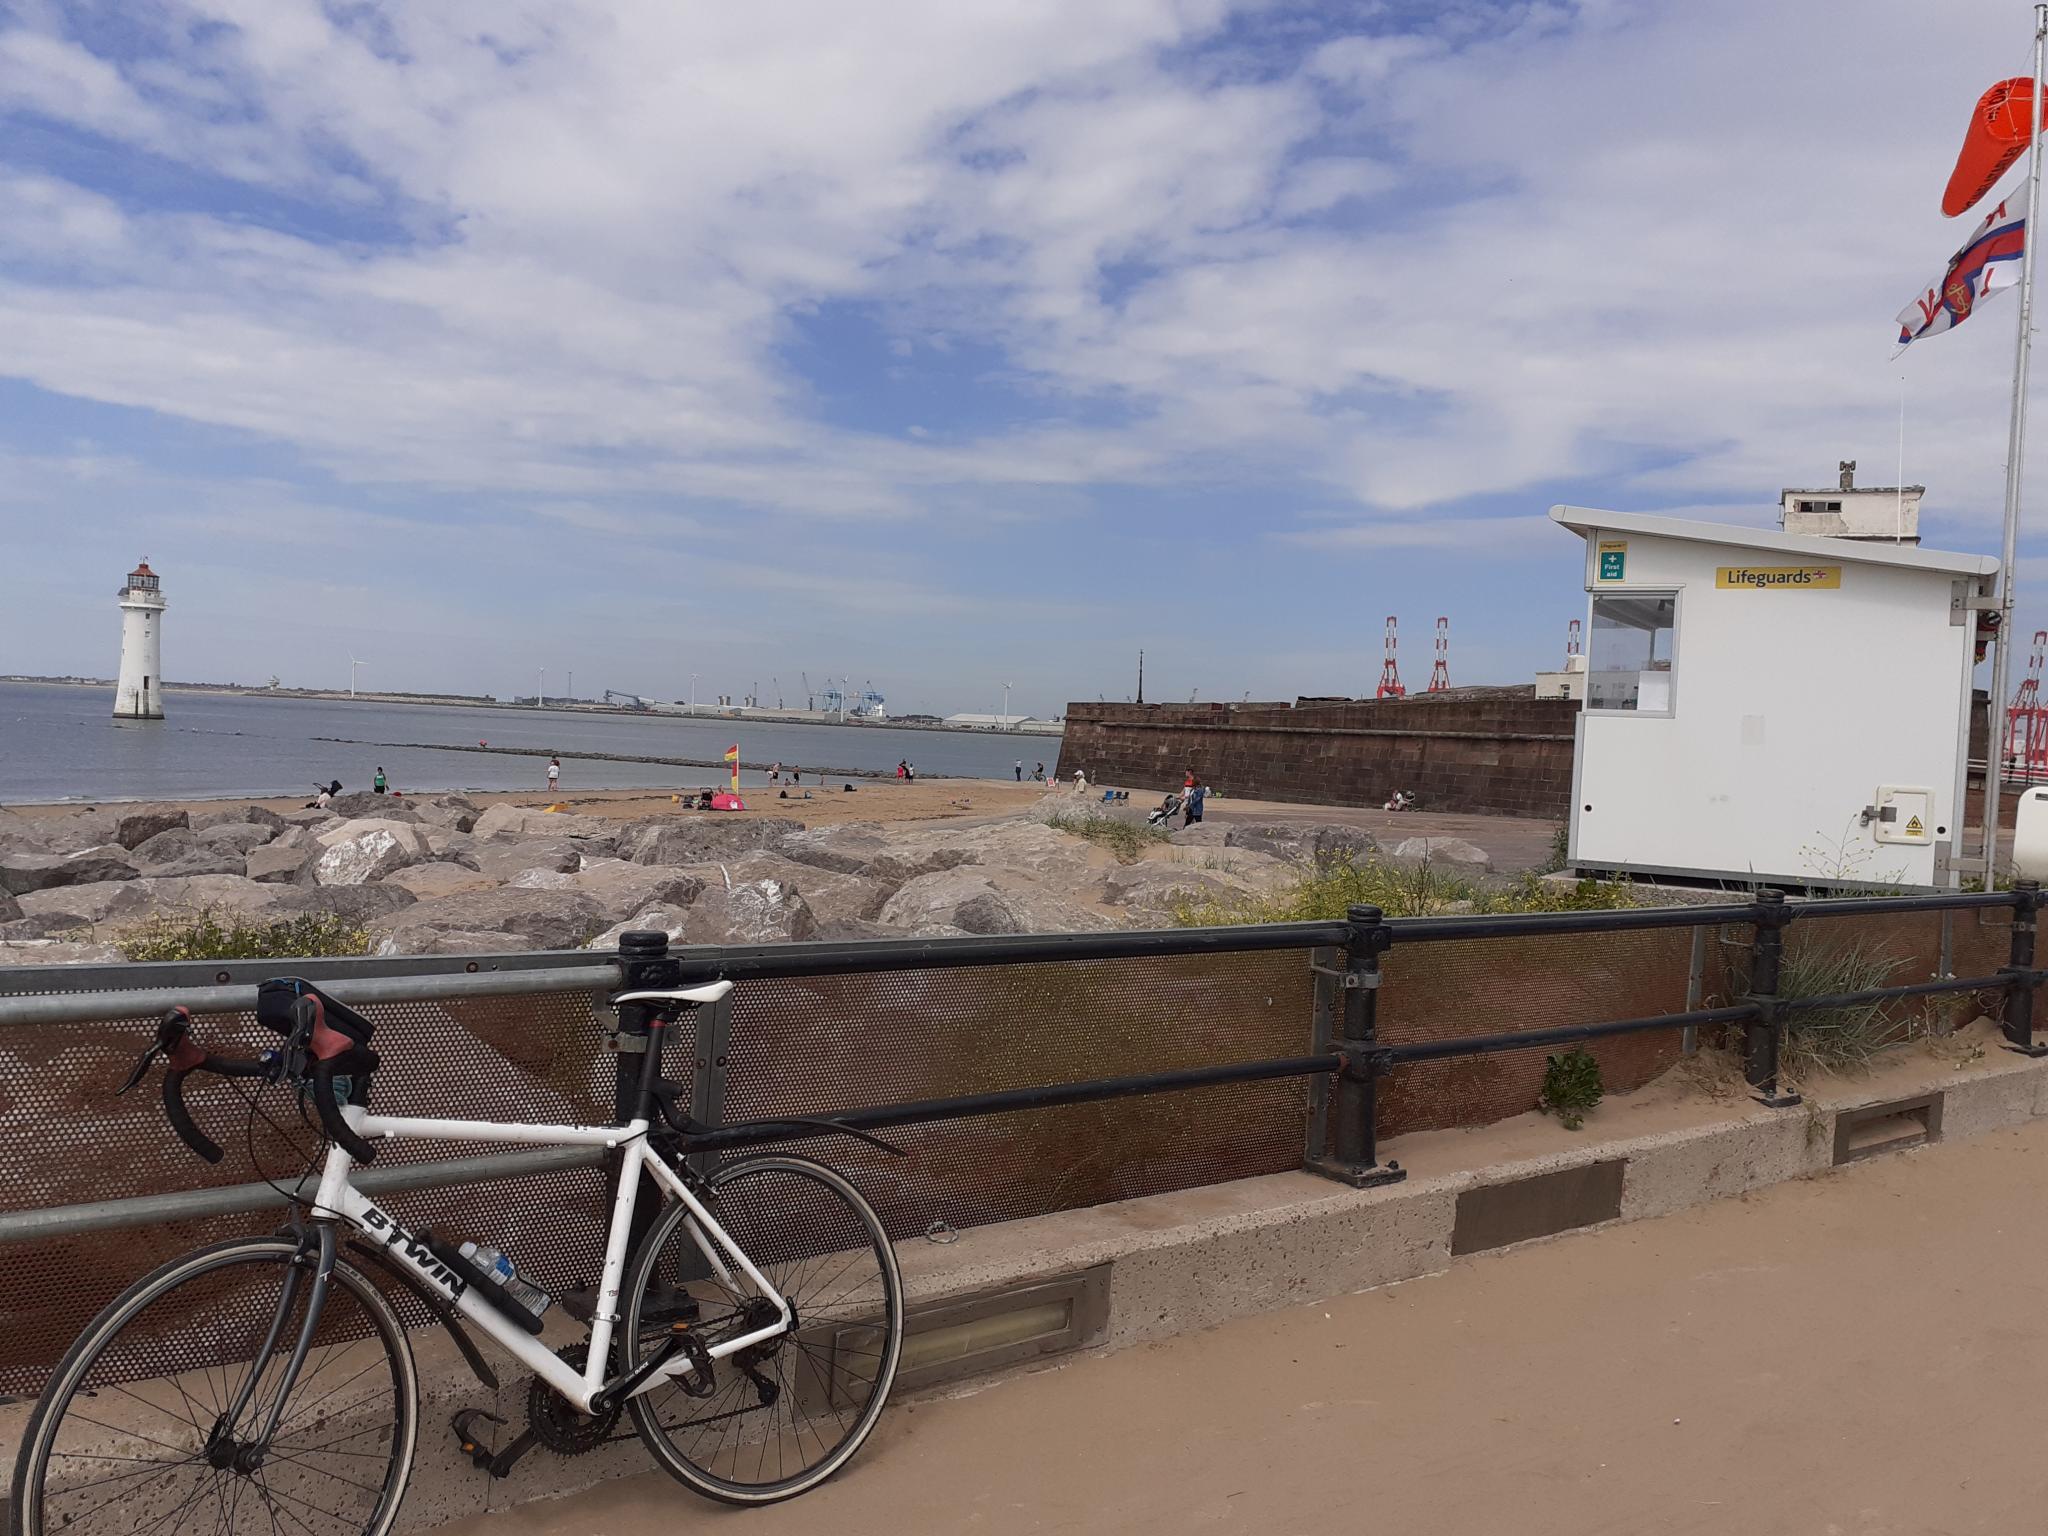 On my bike-20210615_151535-jpg